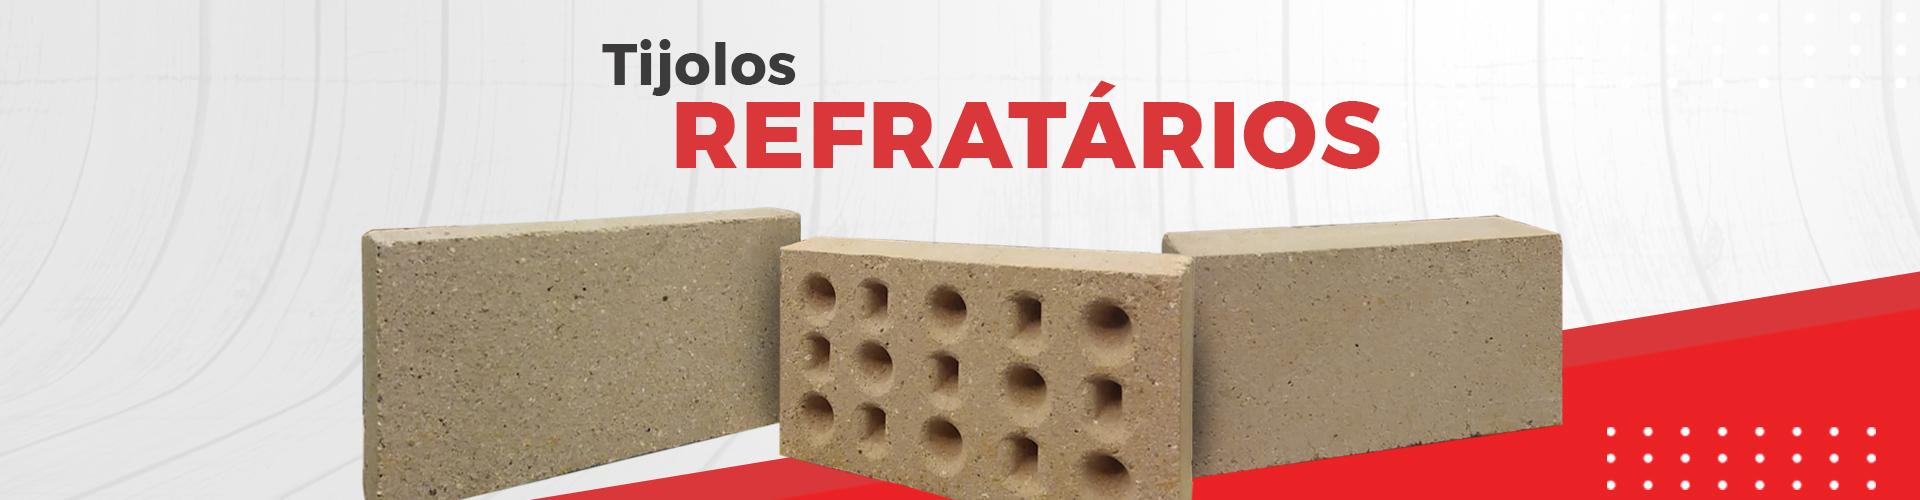 banner-tijolos_refratarios